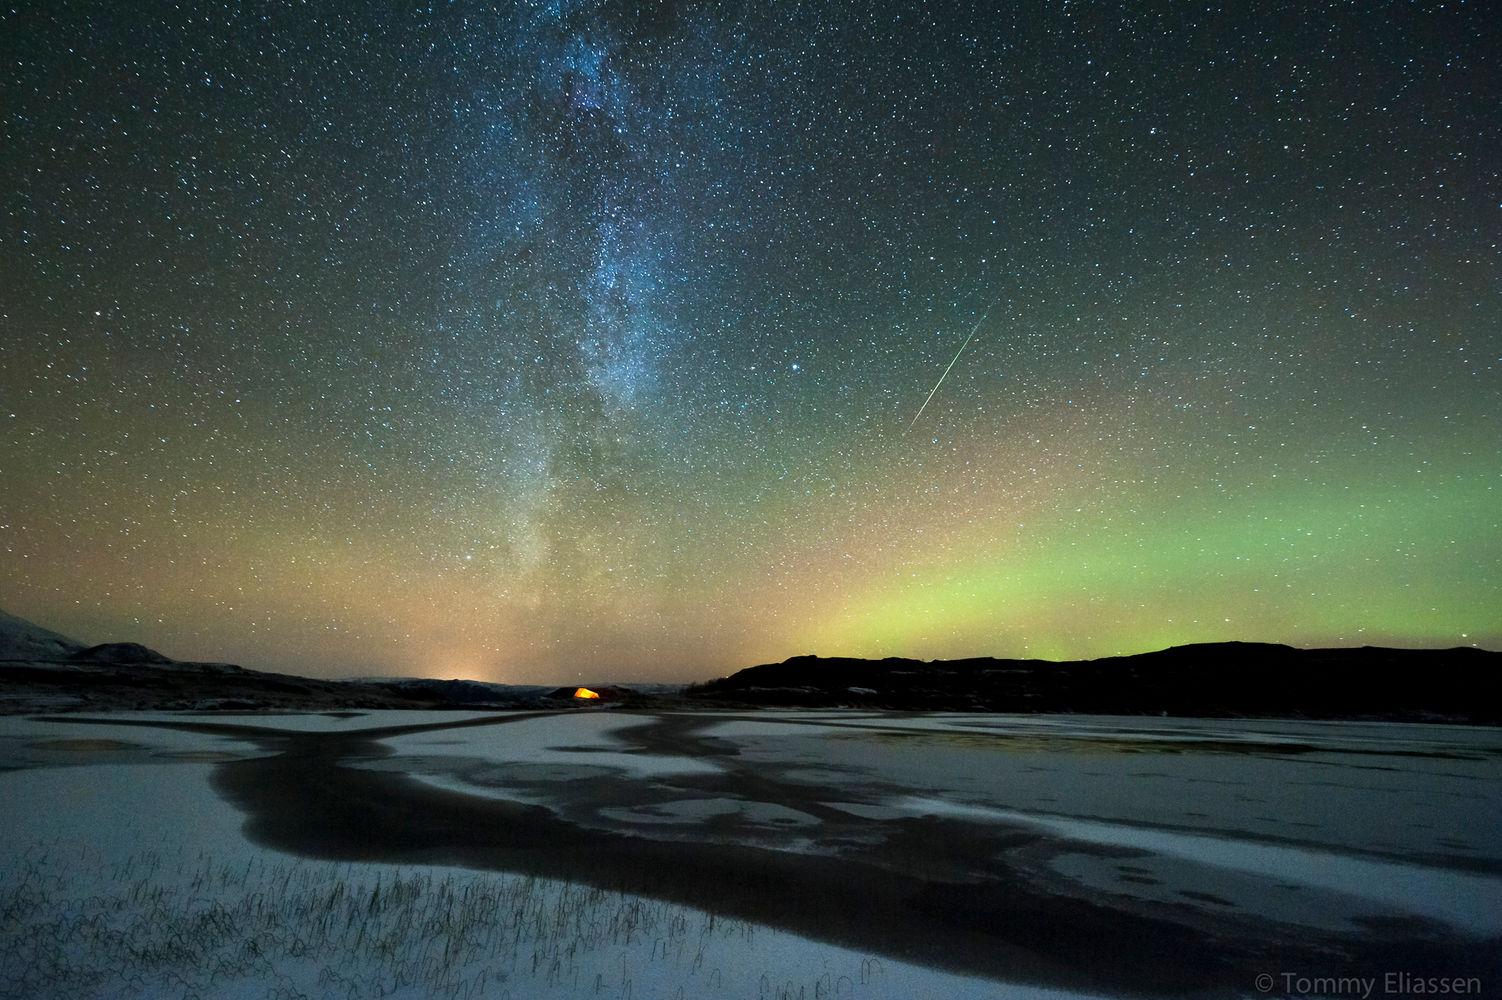 northern lights comet - photo #15